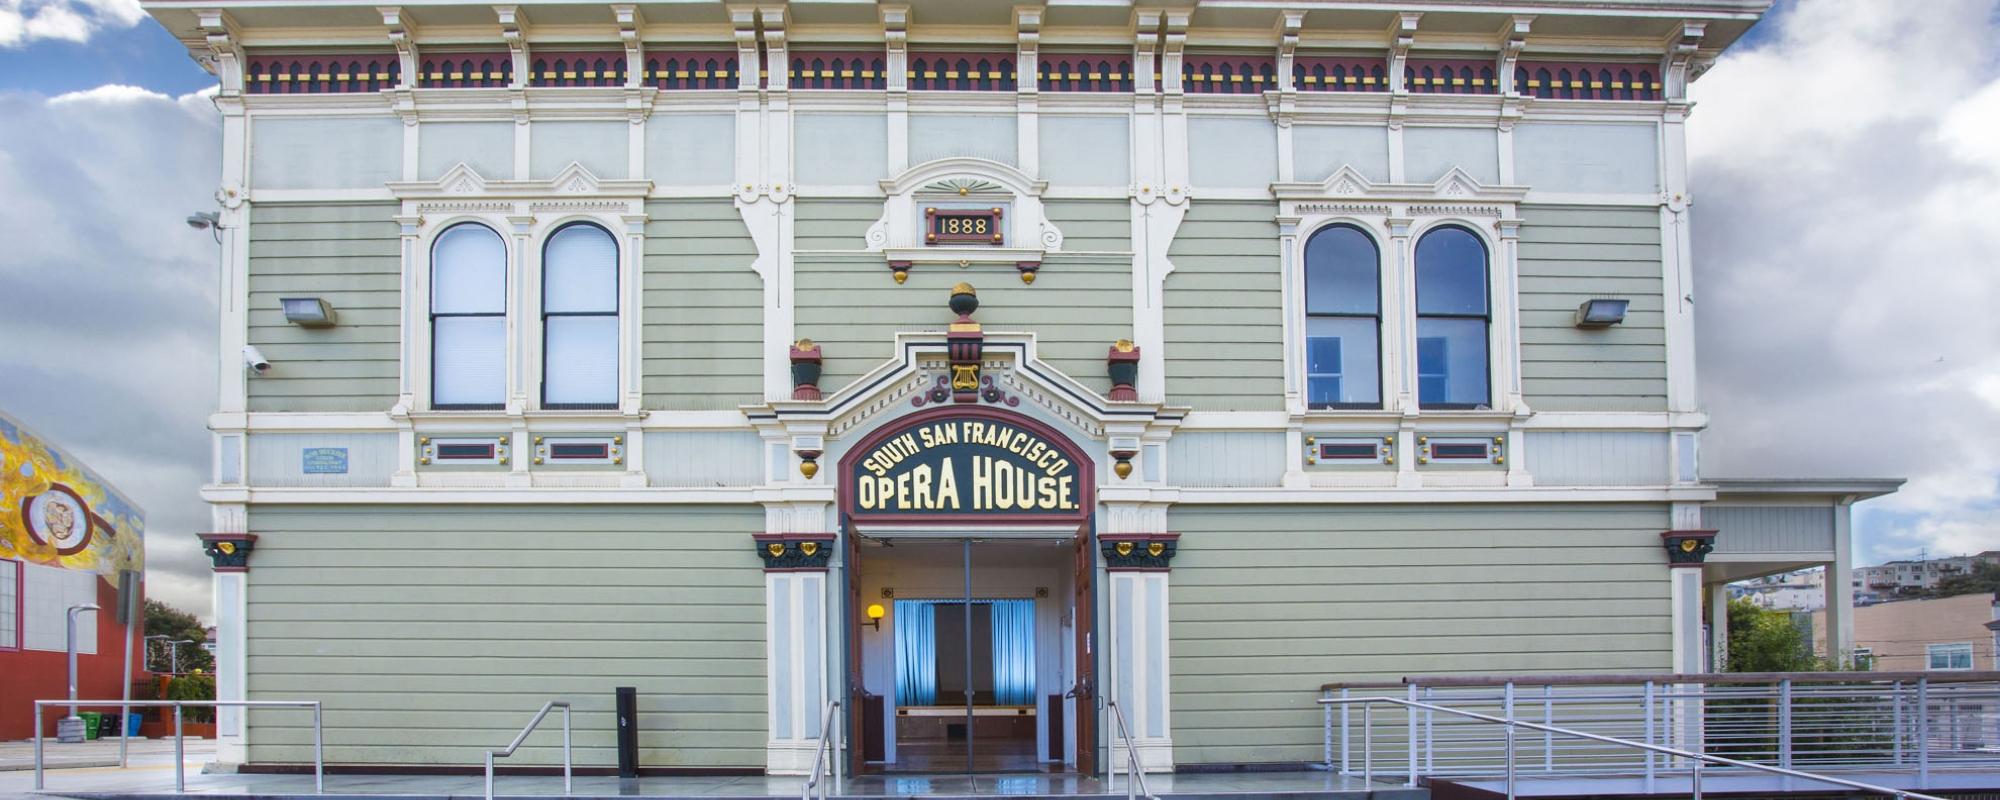 Bayview Opera House exterior